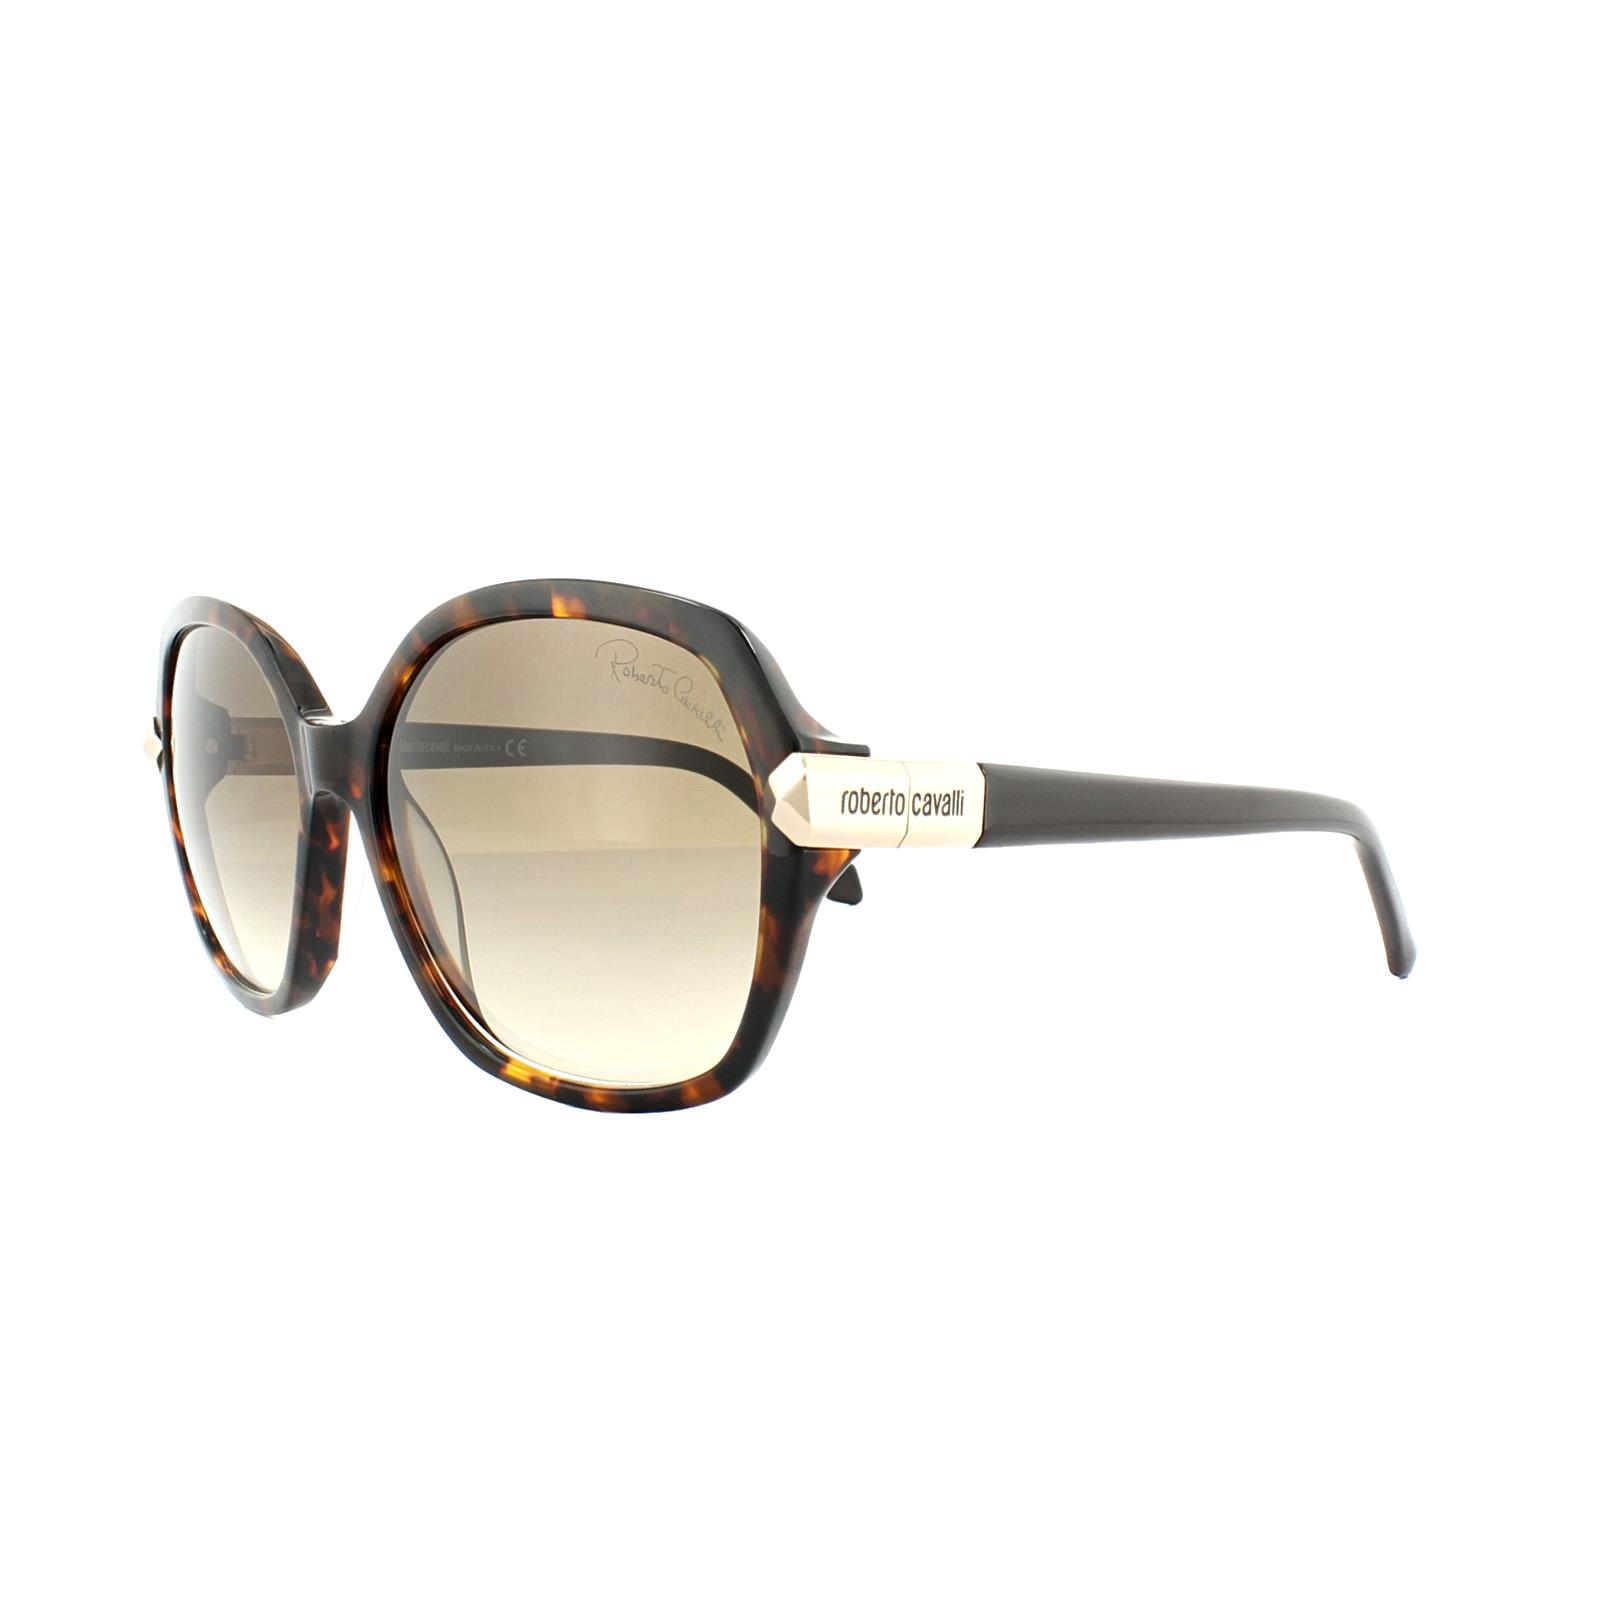 7bd1ac8f02 Sentinel Roberto Cavalli Sunglasses Menkib RC903S 52G Dark Havana Gold  Brown Gradient